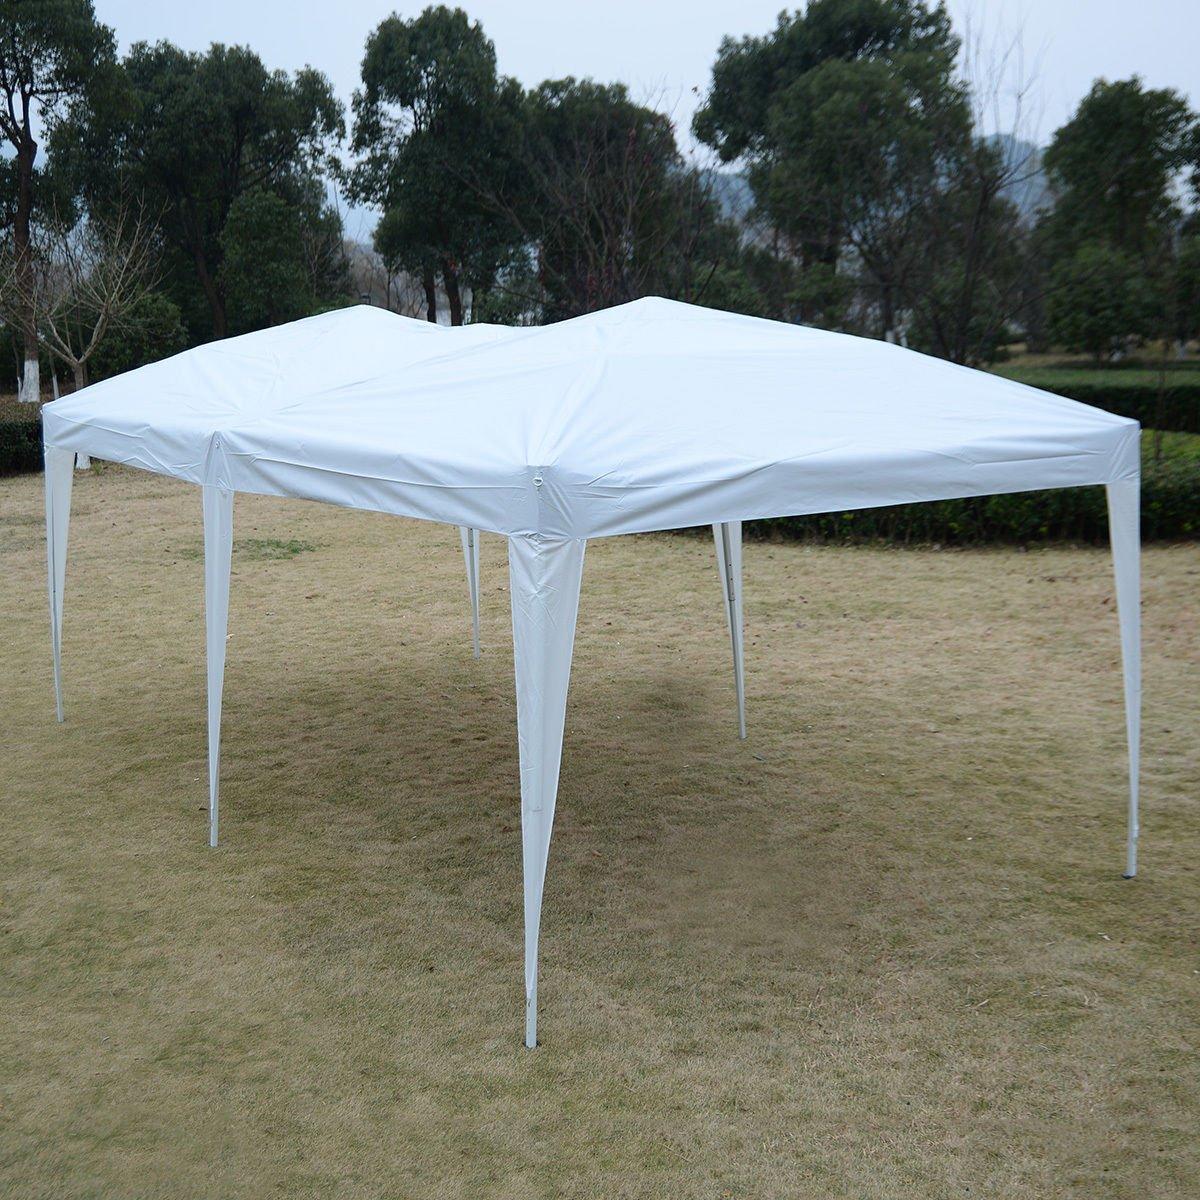 White 10'X20' EZ POP UP Gazebo Wedding Party Tent Folding Canopy Carry Bag Cross-Ba by Tamsun